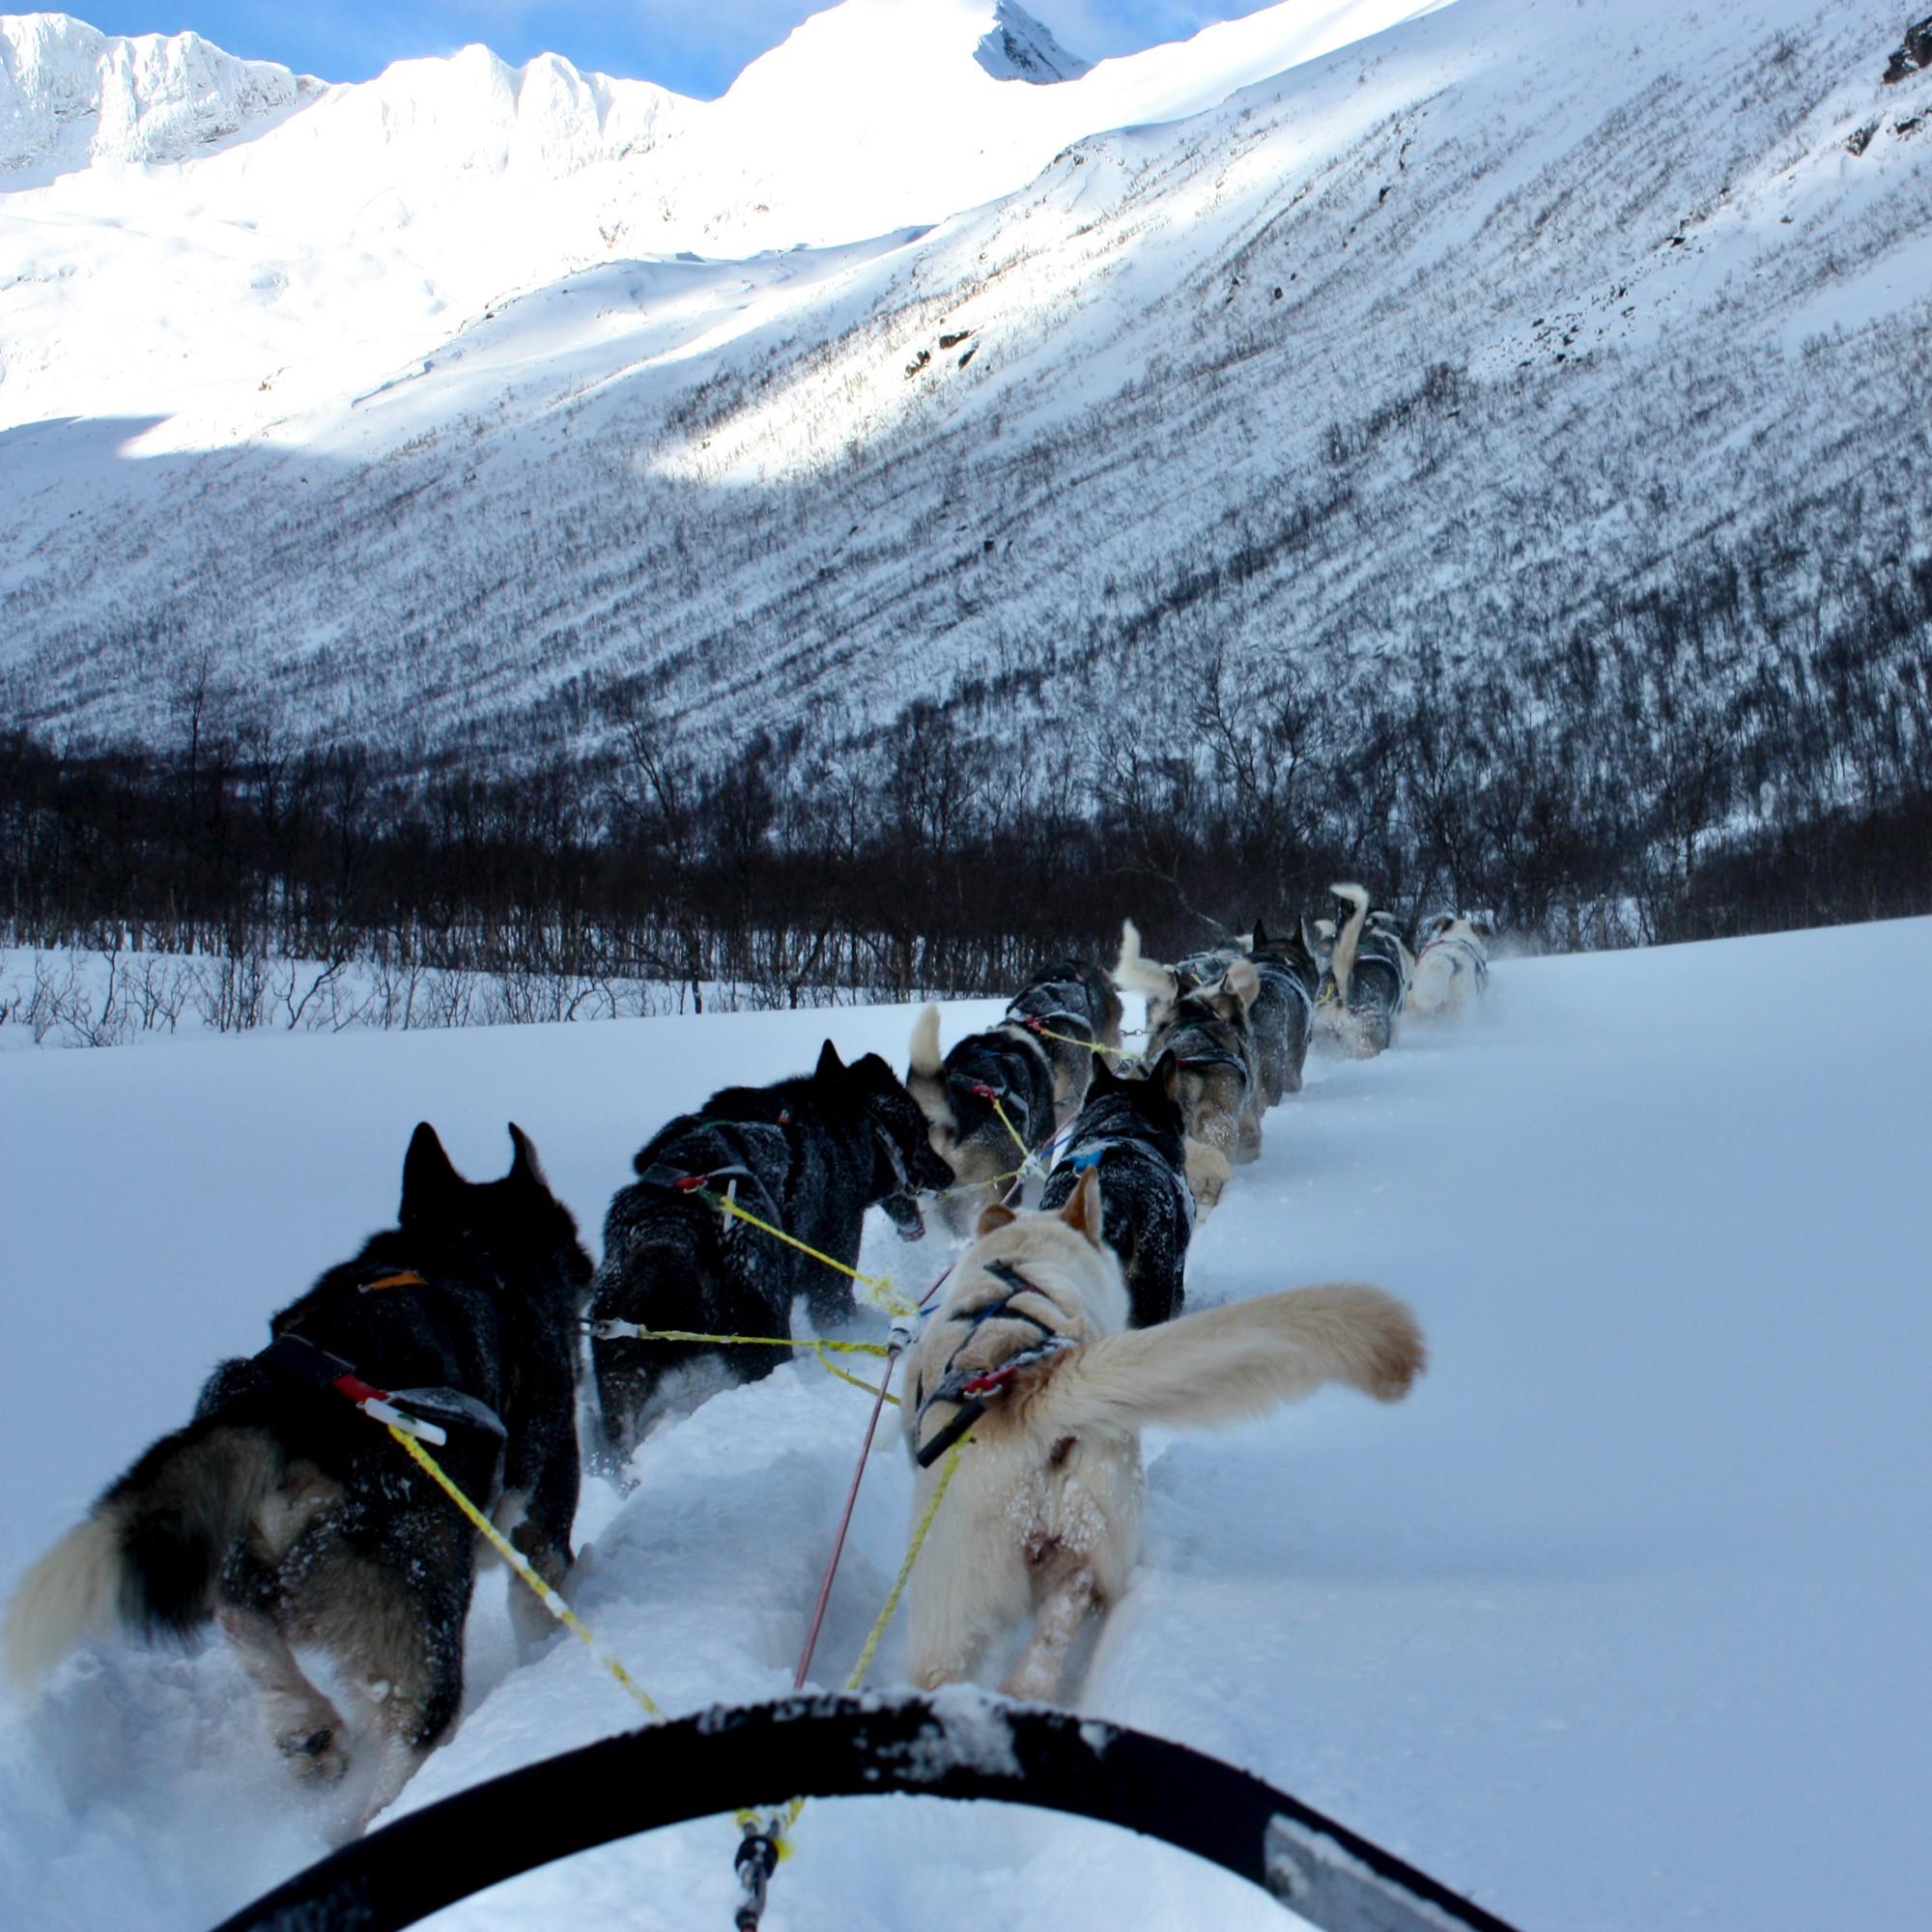 Dogsledding day-trip